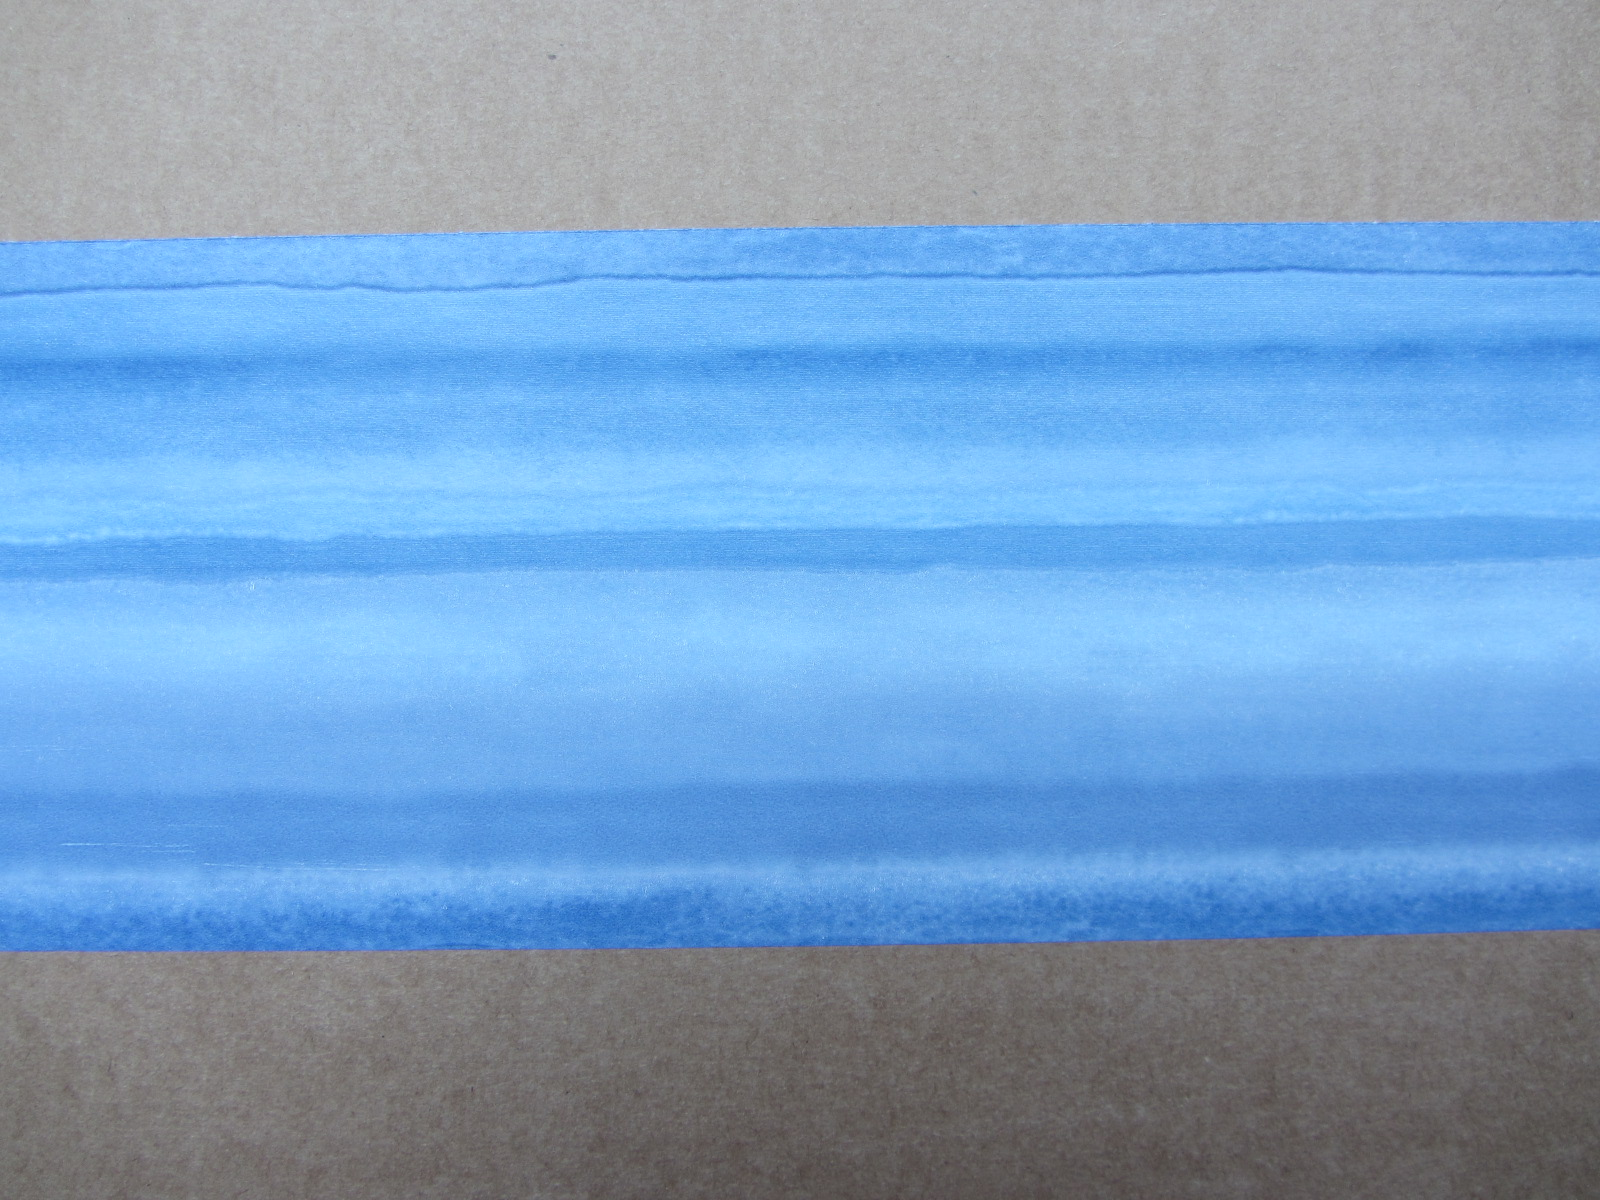 SHADES OF BLUE WALLPAPER BORDER SELF ADHESIVE BEDROOM 5 x 12 30243 1600x1200